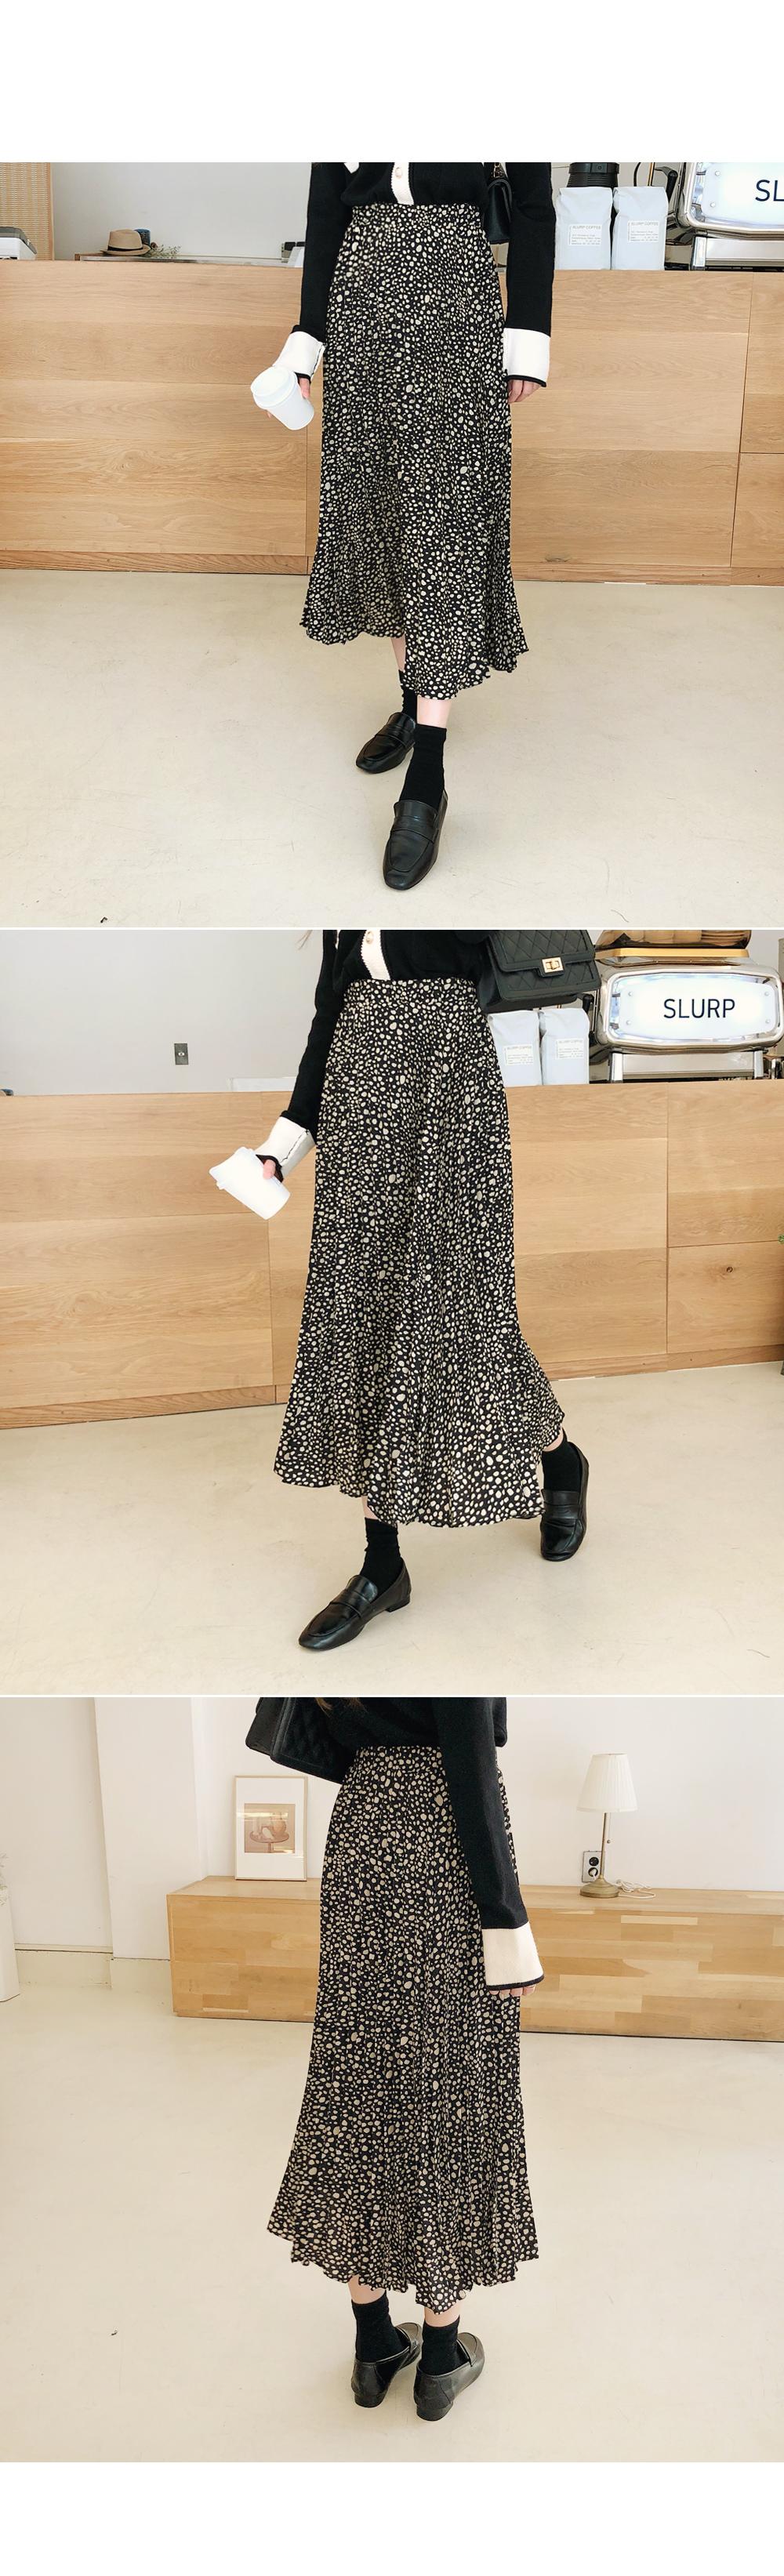 Attractive leopard skirt